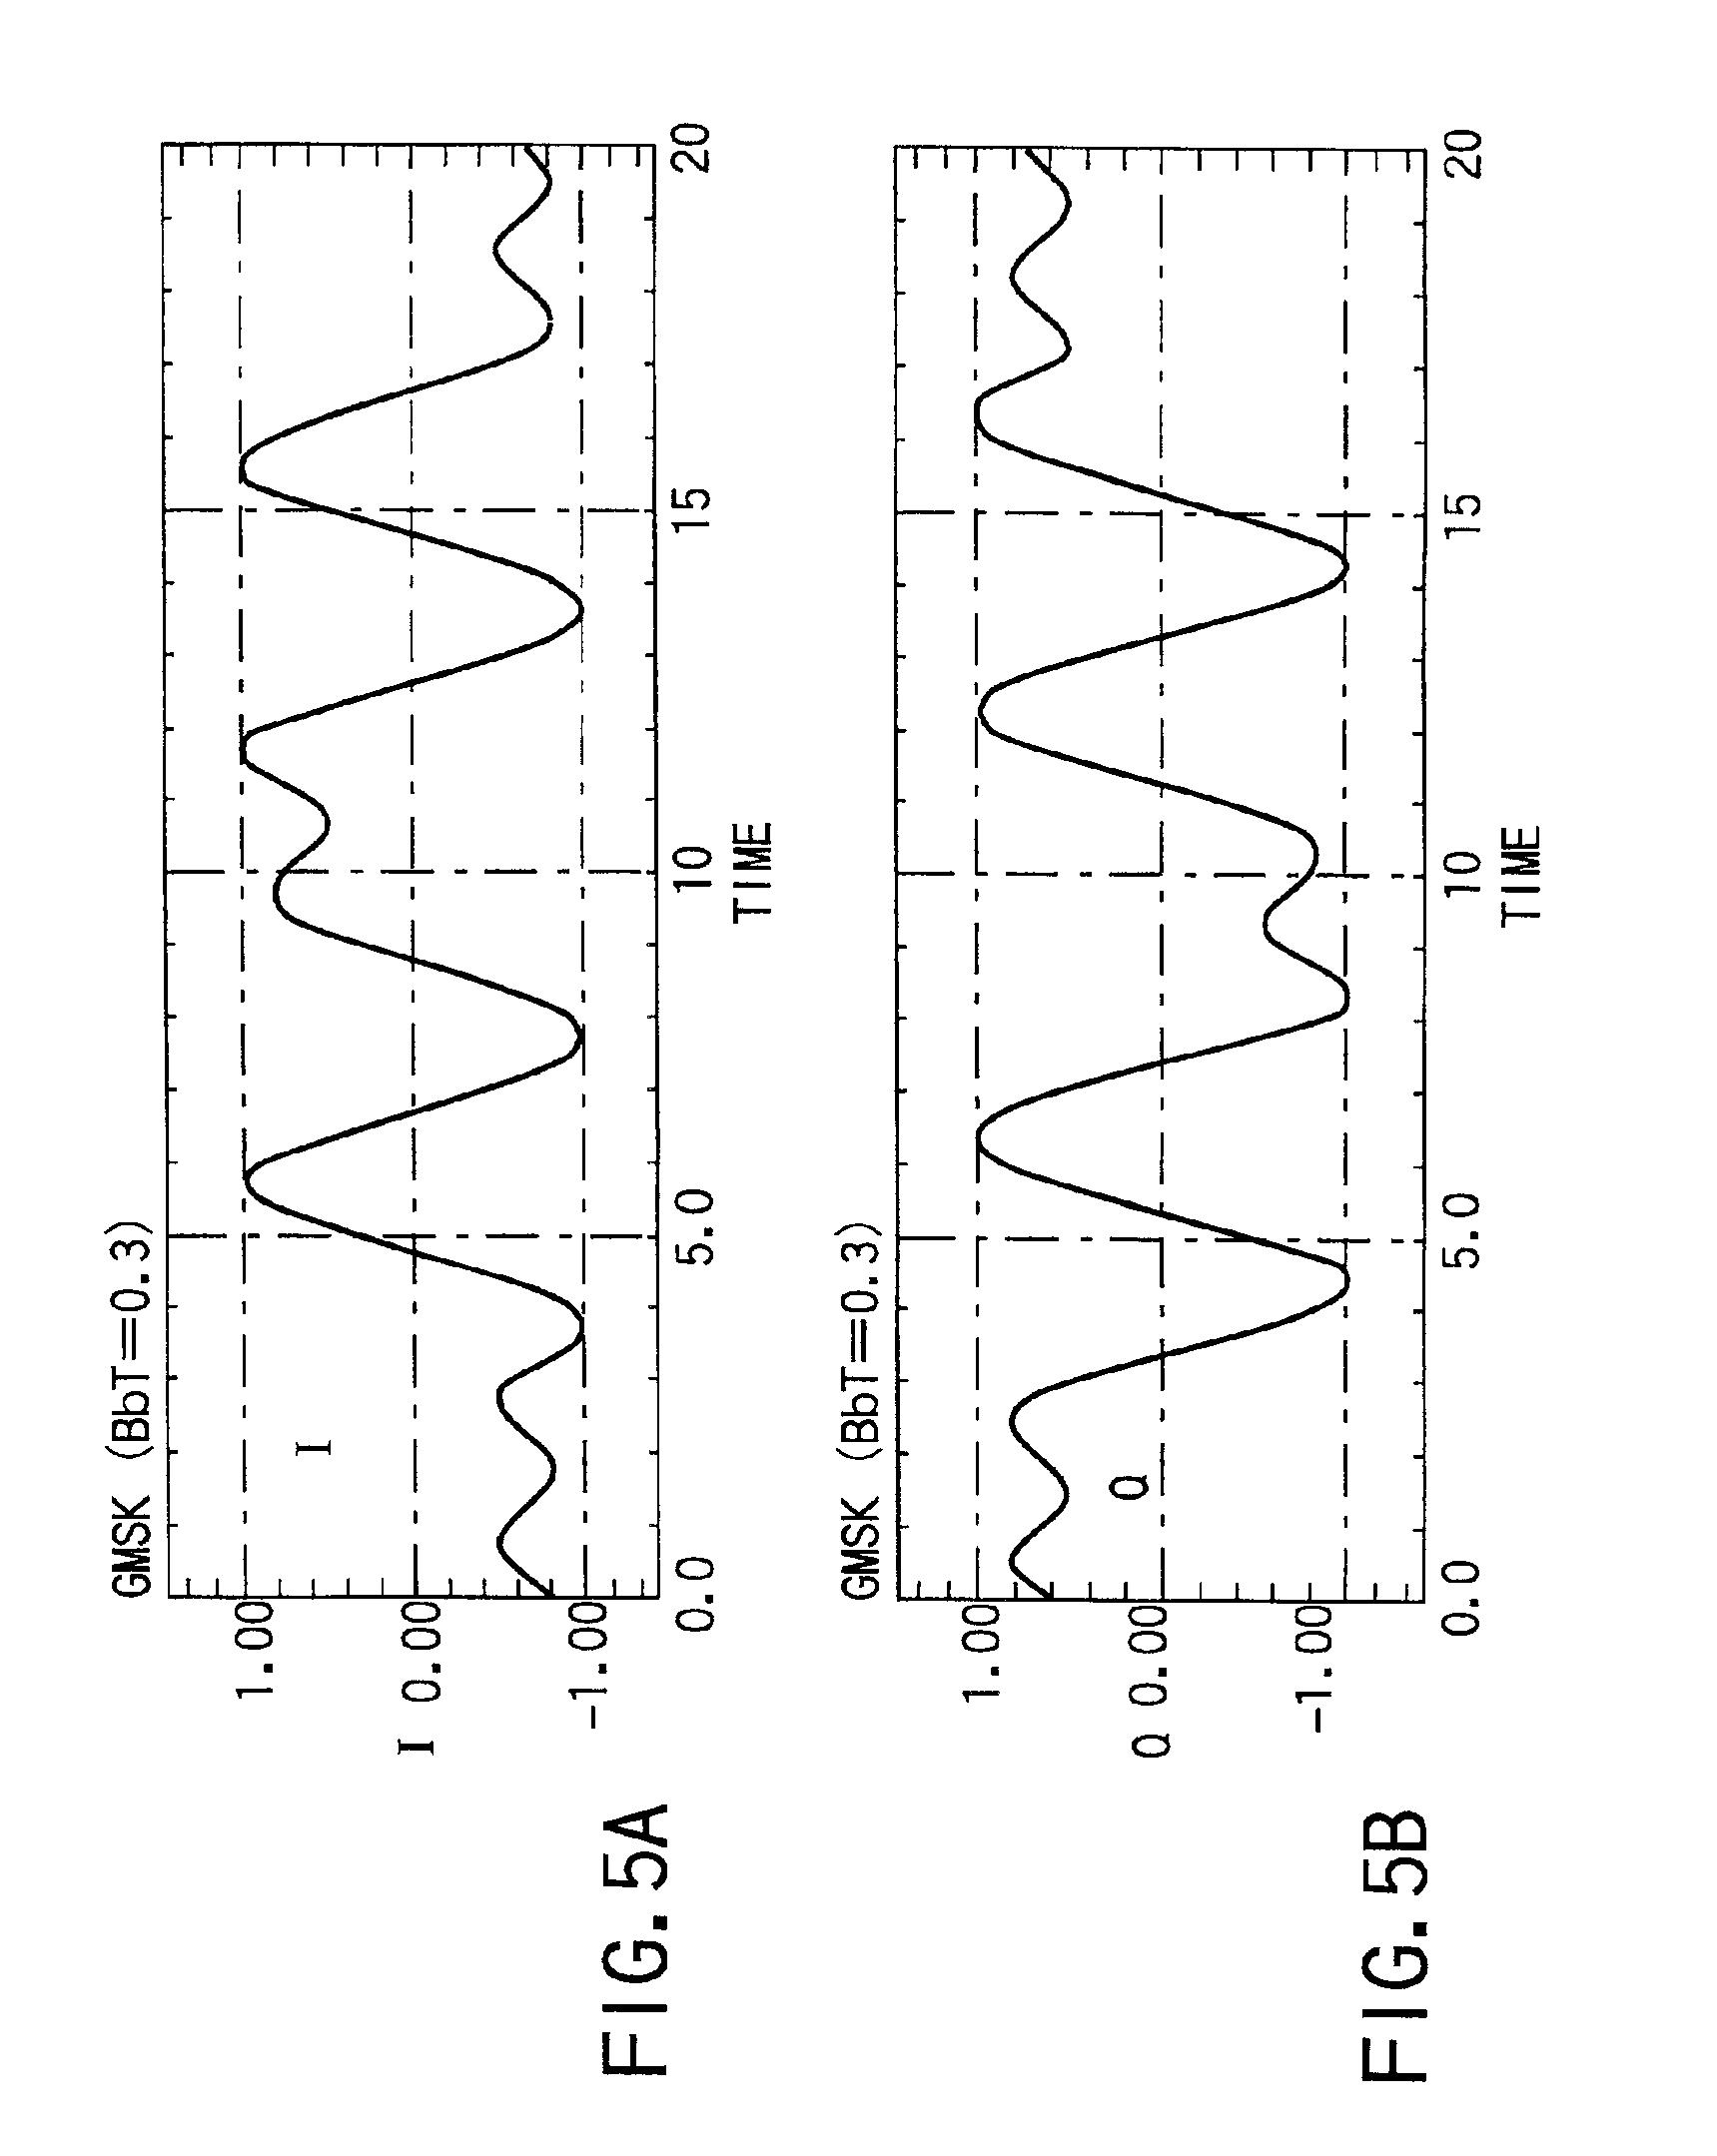 patent us6914943 - signal modulation circuit and signal modulation method